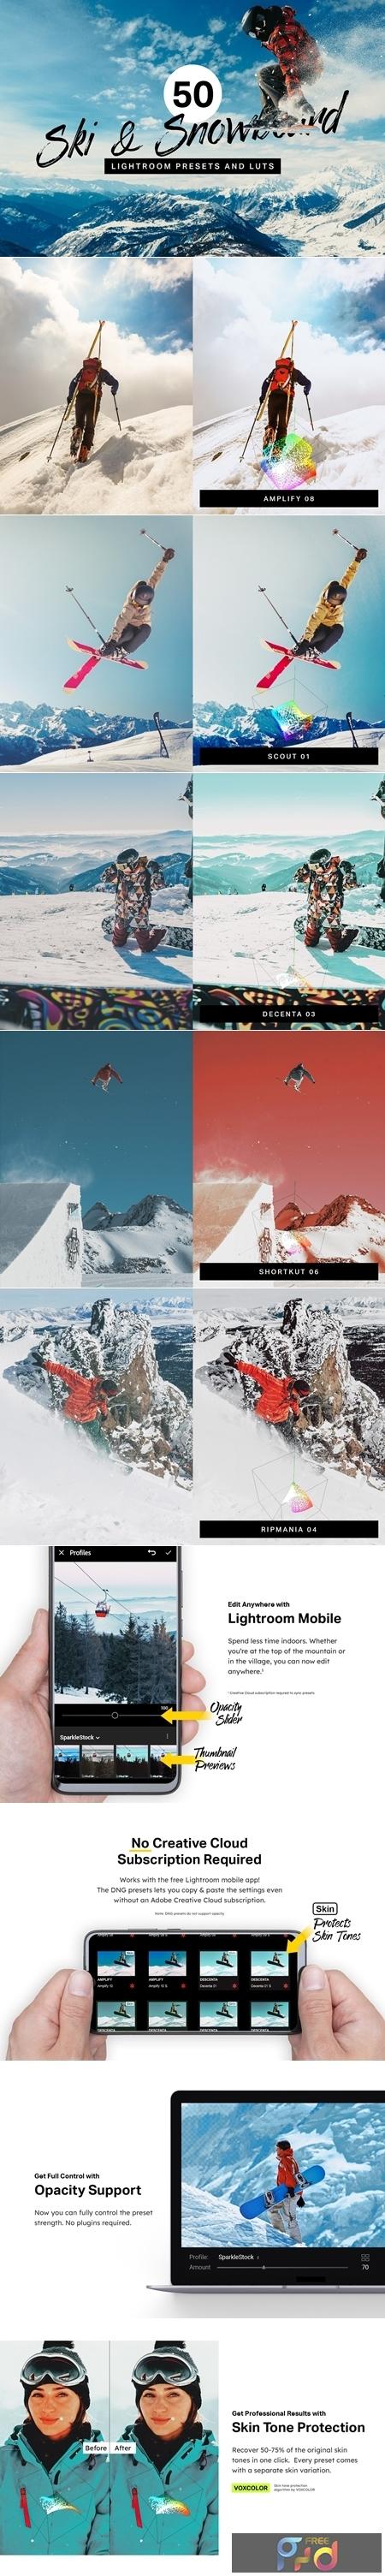 50 Ski & Snowboard Lightroom Presets 4310535 1